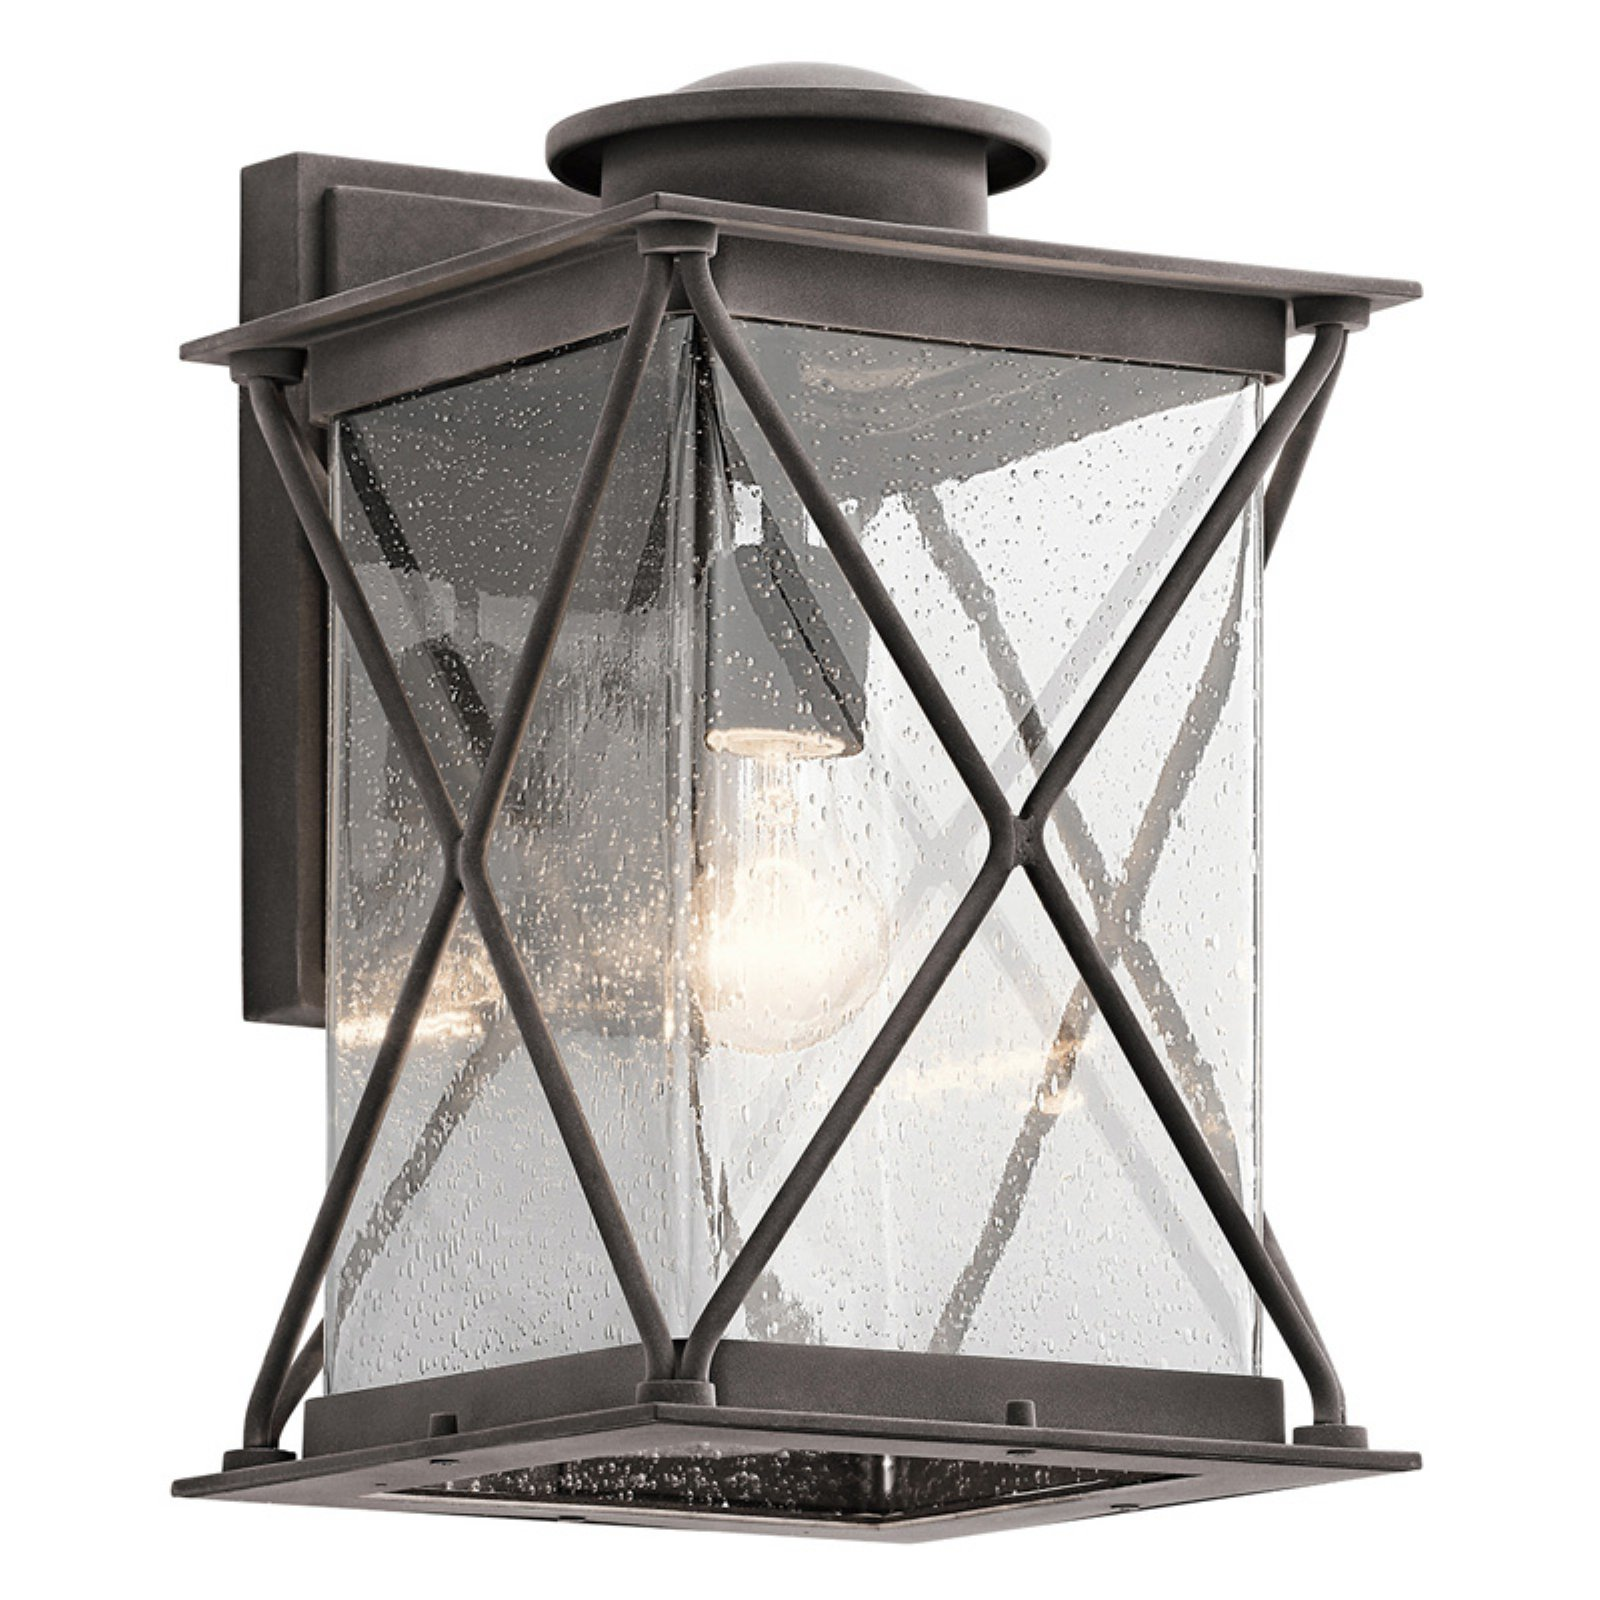 Kichler Argyle 49745 Outdoor Wall Light